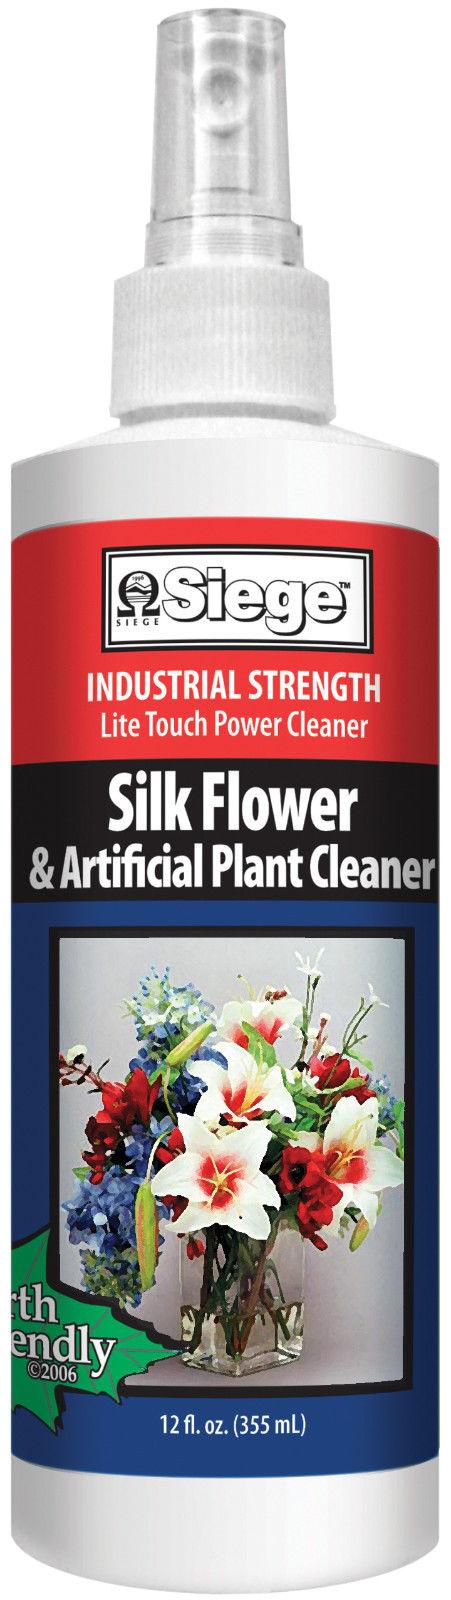 Siege silk flower cleaner 12 oz earth friendly made in usa 771l siege silk flower cleaner 12 oz earth friendly made in usa 771l mightylinksfo